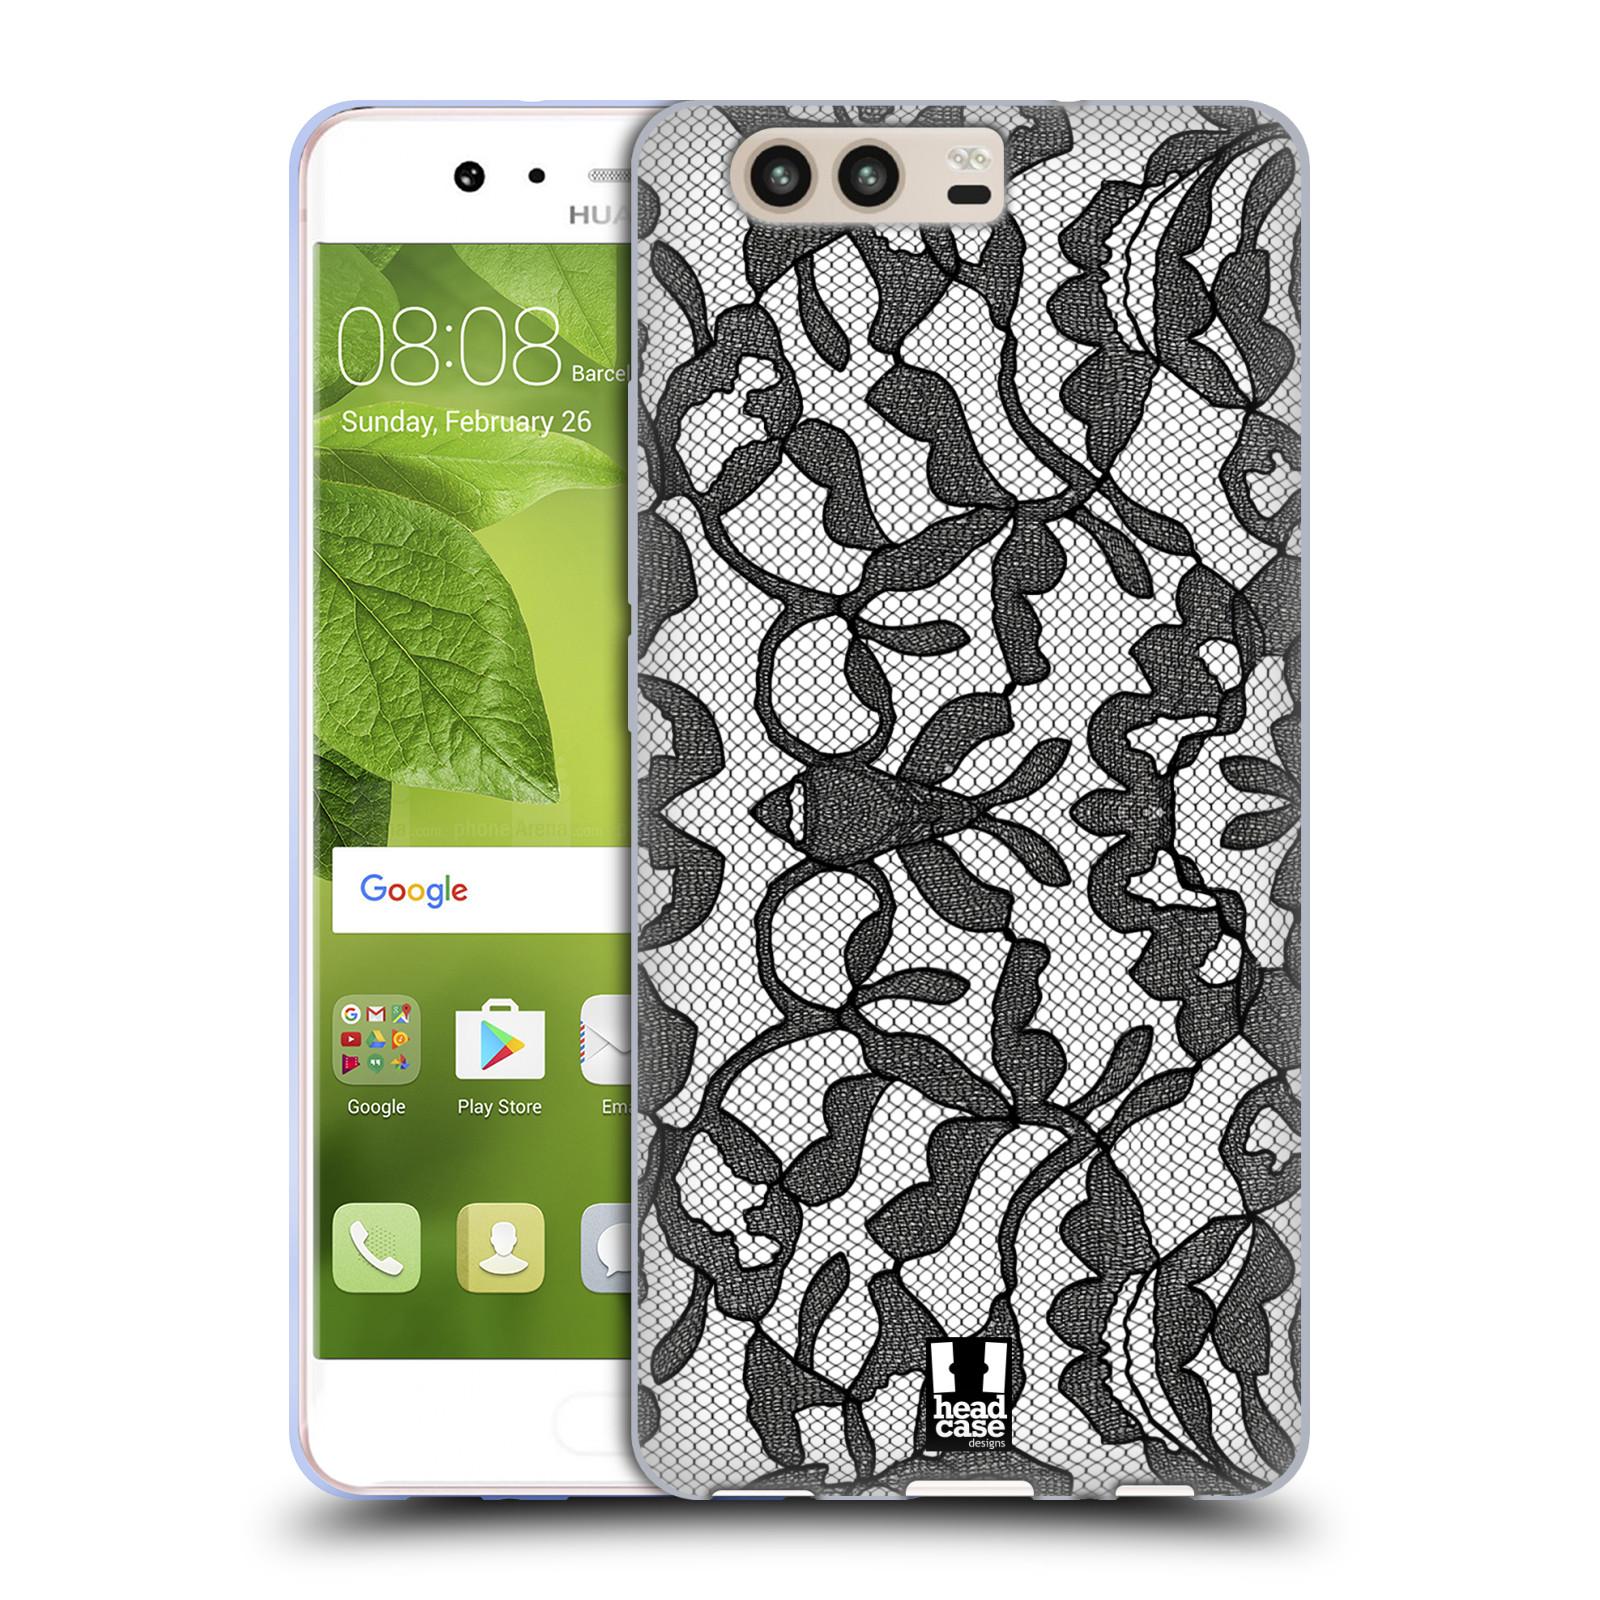 Silikonové pouzdro na mobil Huawei P10 - Head Case - LEAFY KRAJKA (Silikonový kryt či obal na mobilní telefon Huawei P10)